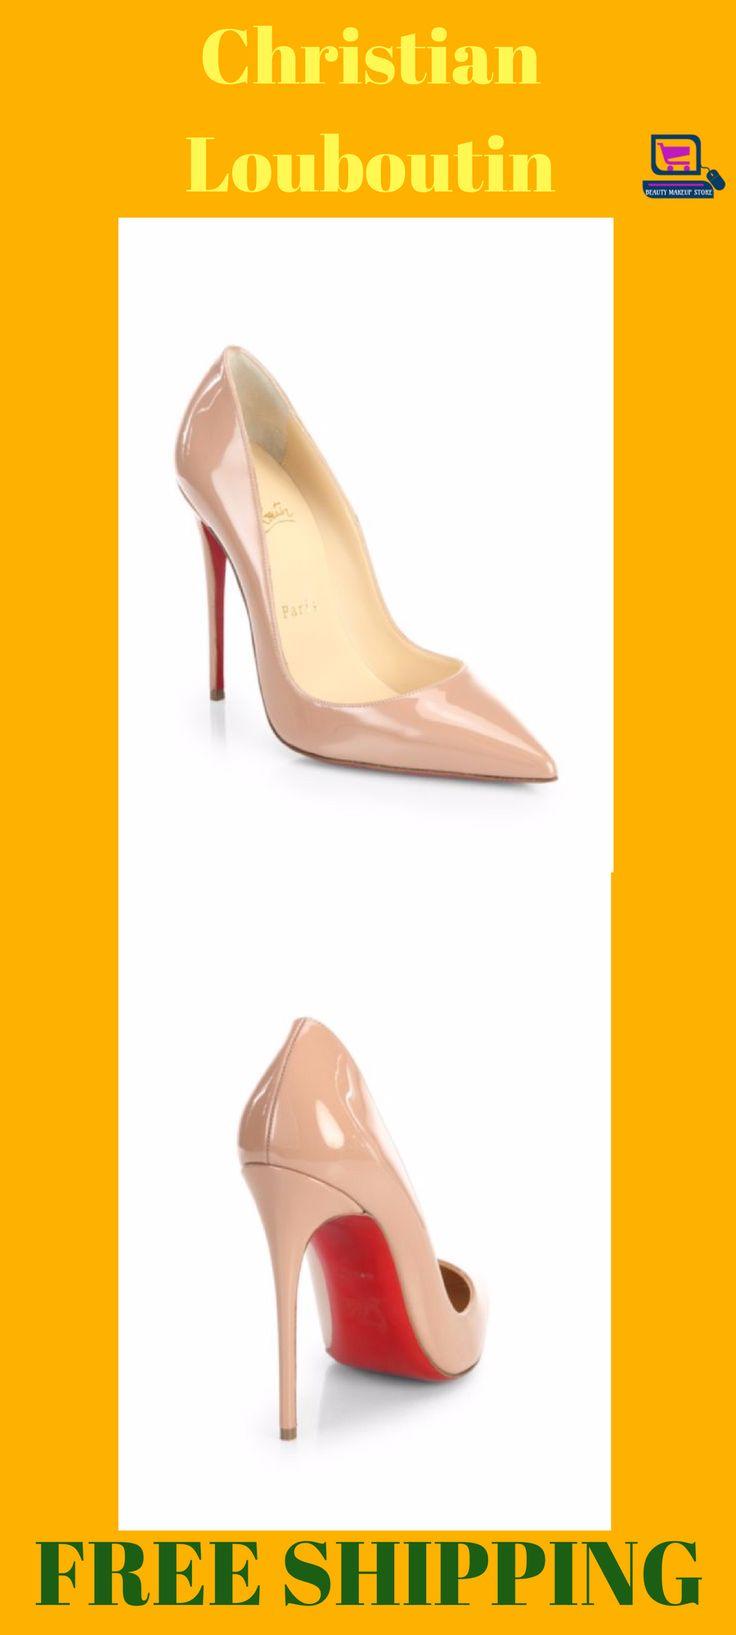 Christian louboutin high heel shoes #highheelshoes #highheelshoe #highheels #highheelshoesforwomen high heel shoes | high heel shoes stilettos | high heel shoes for teens | high heel shoes for kids | high heel shoes centerpieces | High Heel Shoes | High heel shoes | High heel shoes |